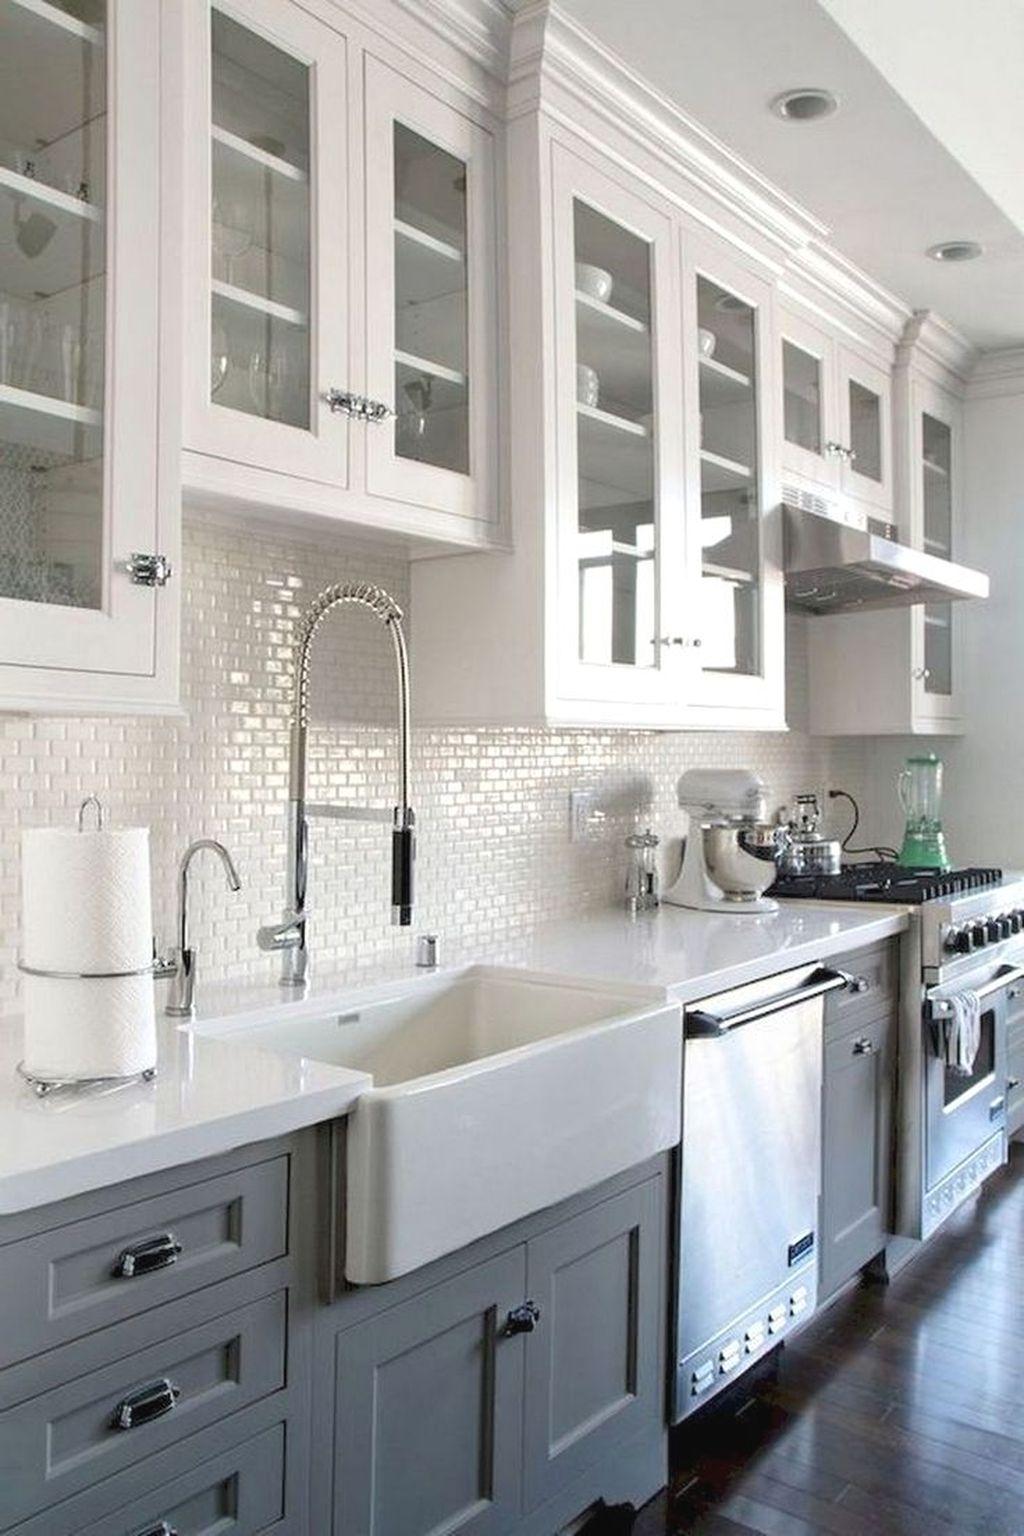 Brilliant Small Kitchen Remodel Design Ideas On A Budget 20